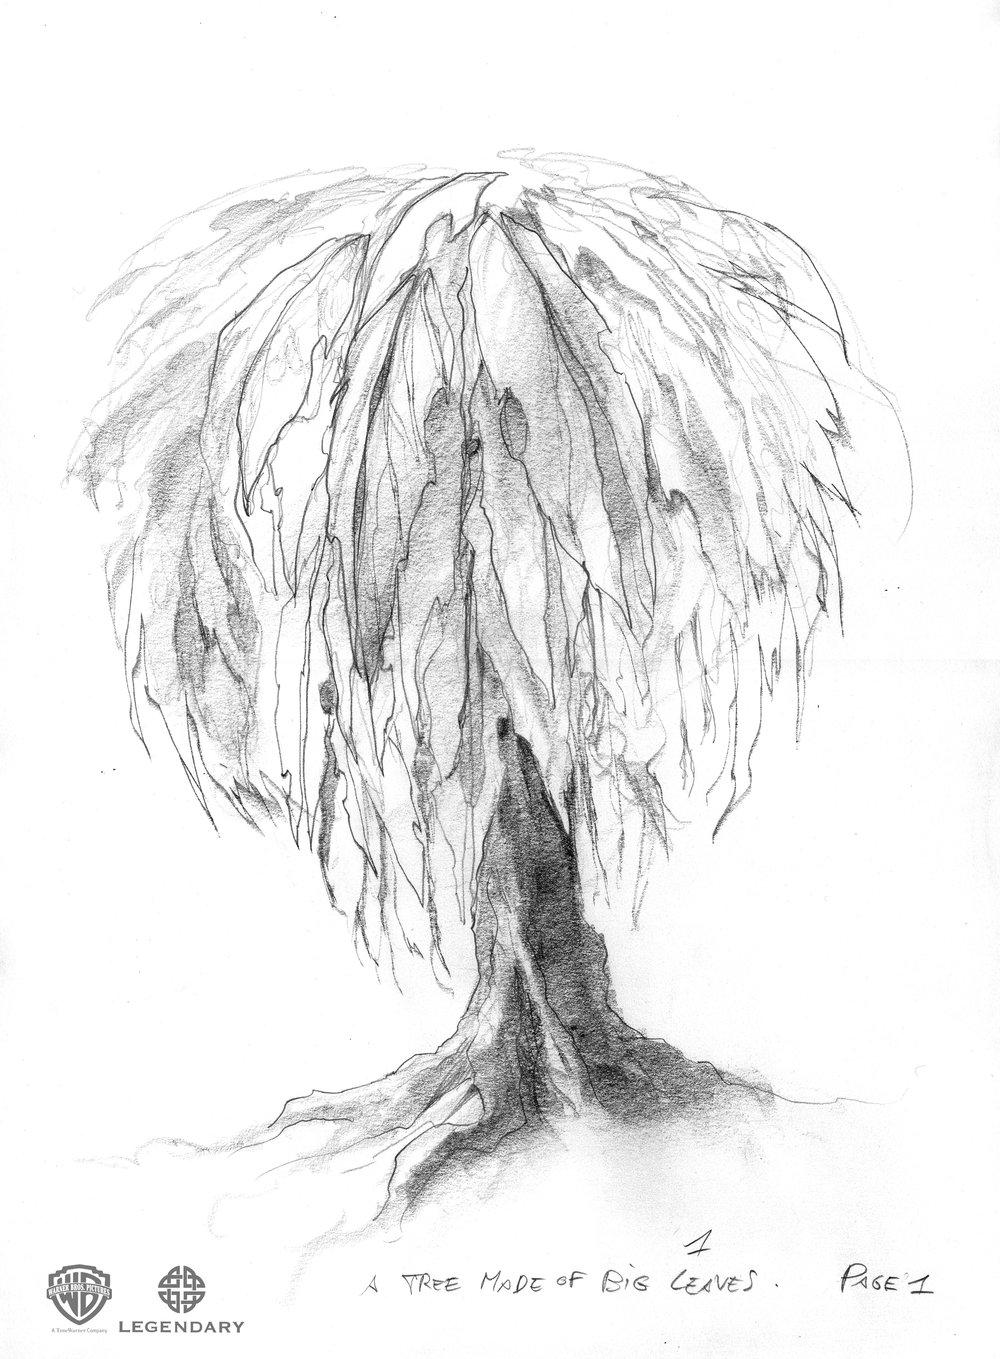 TITAN_TreeOfBirds_SL02.1001.jpg